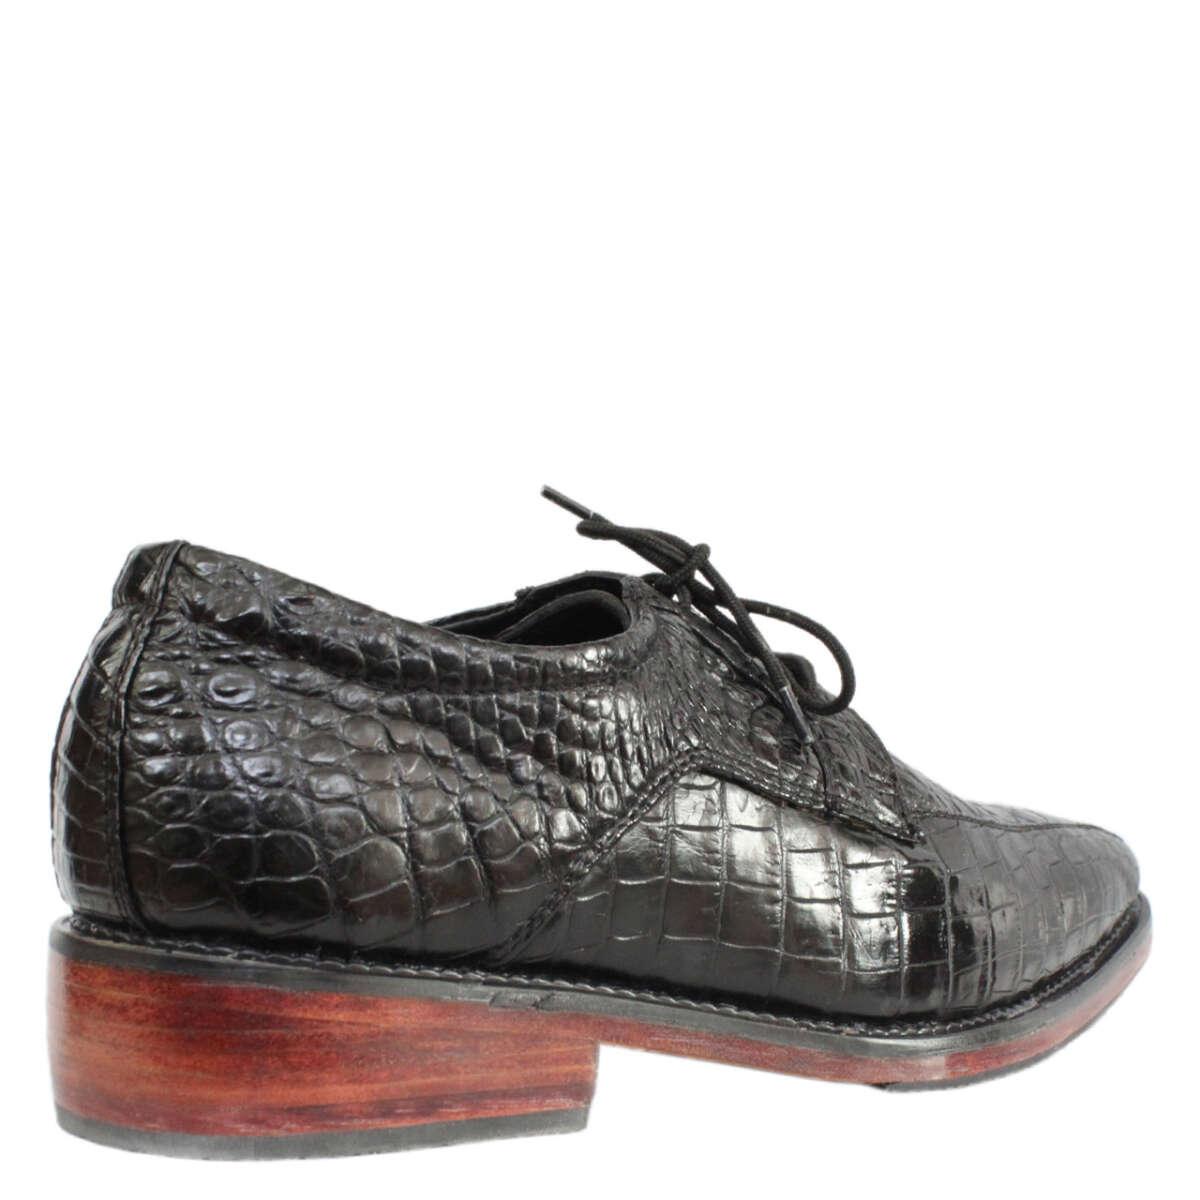 Giày nam da cá sấu S856b